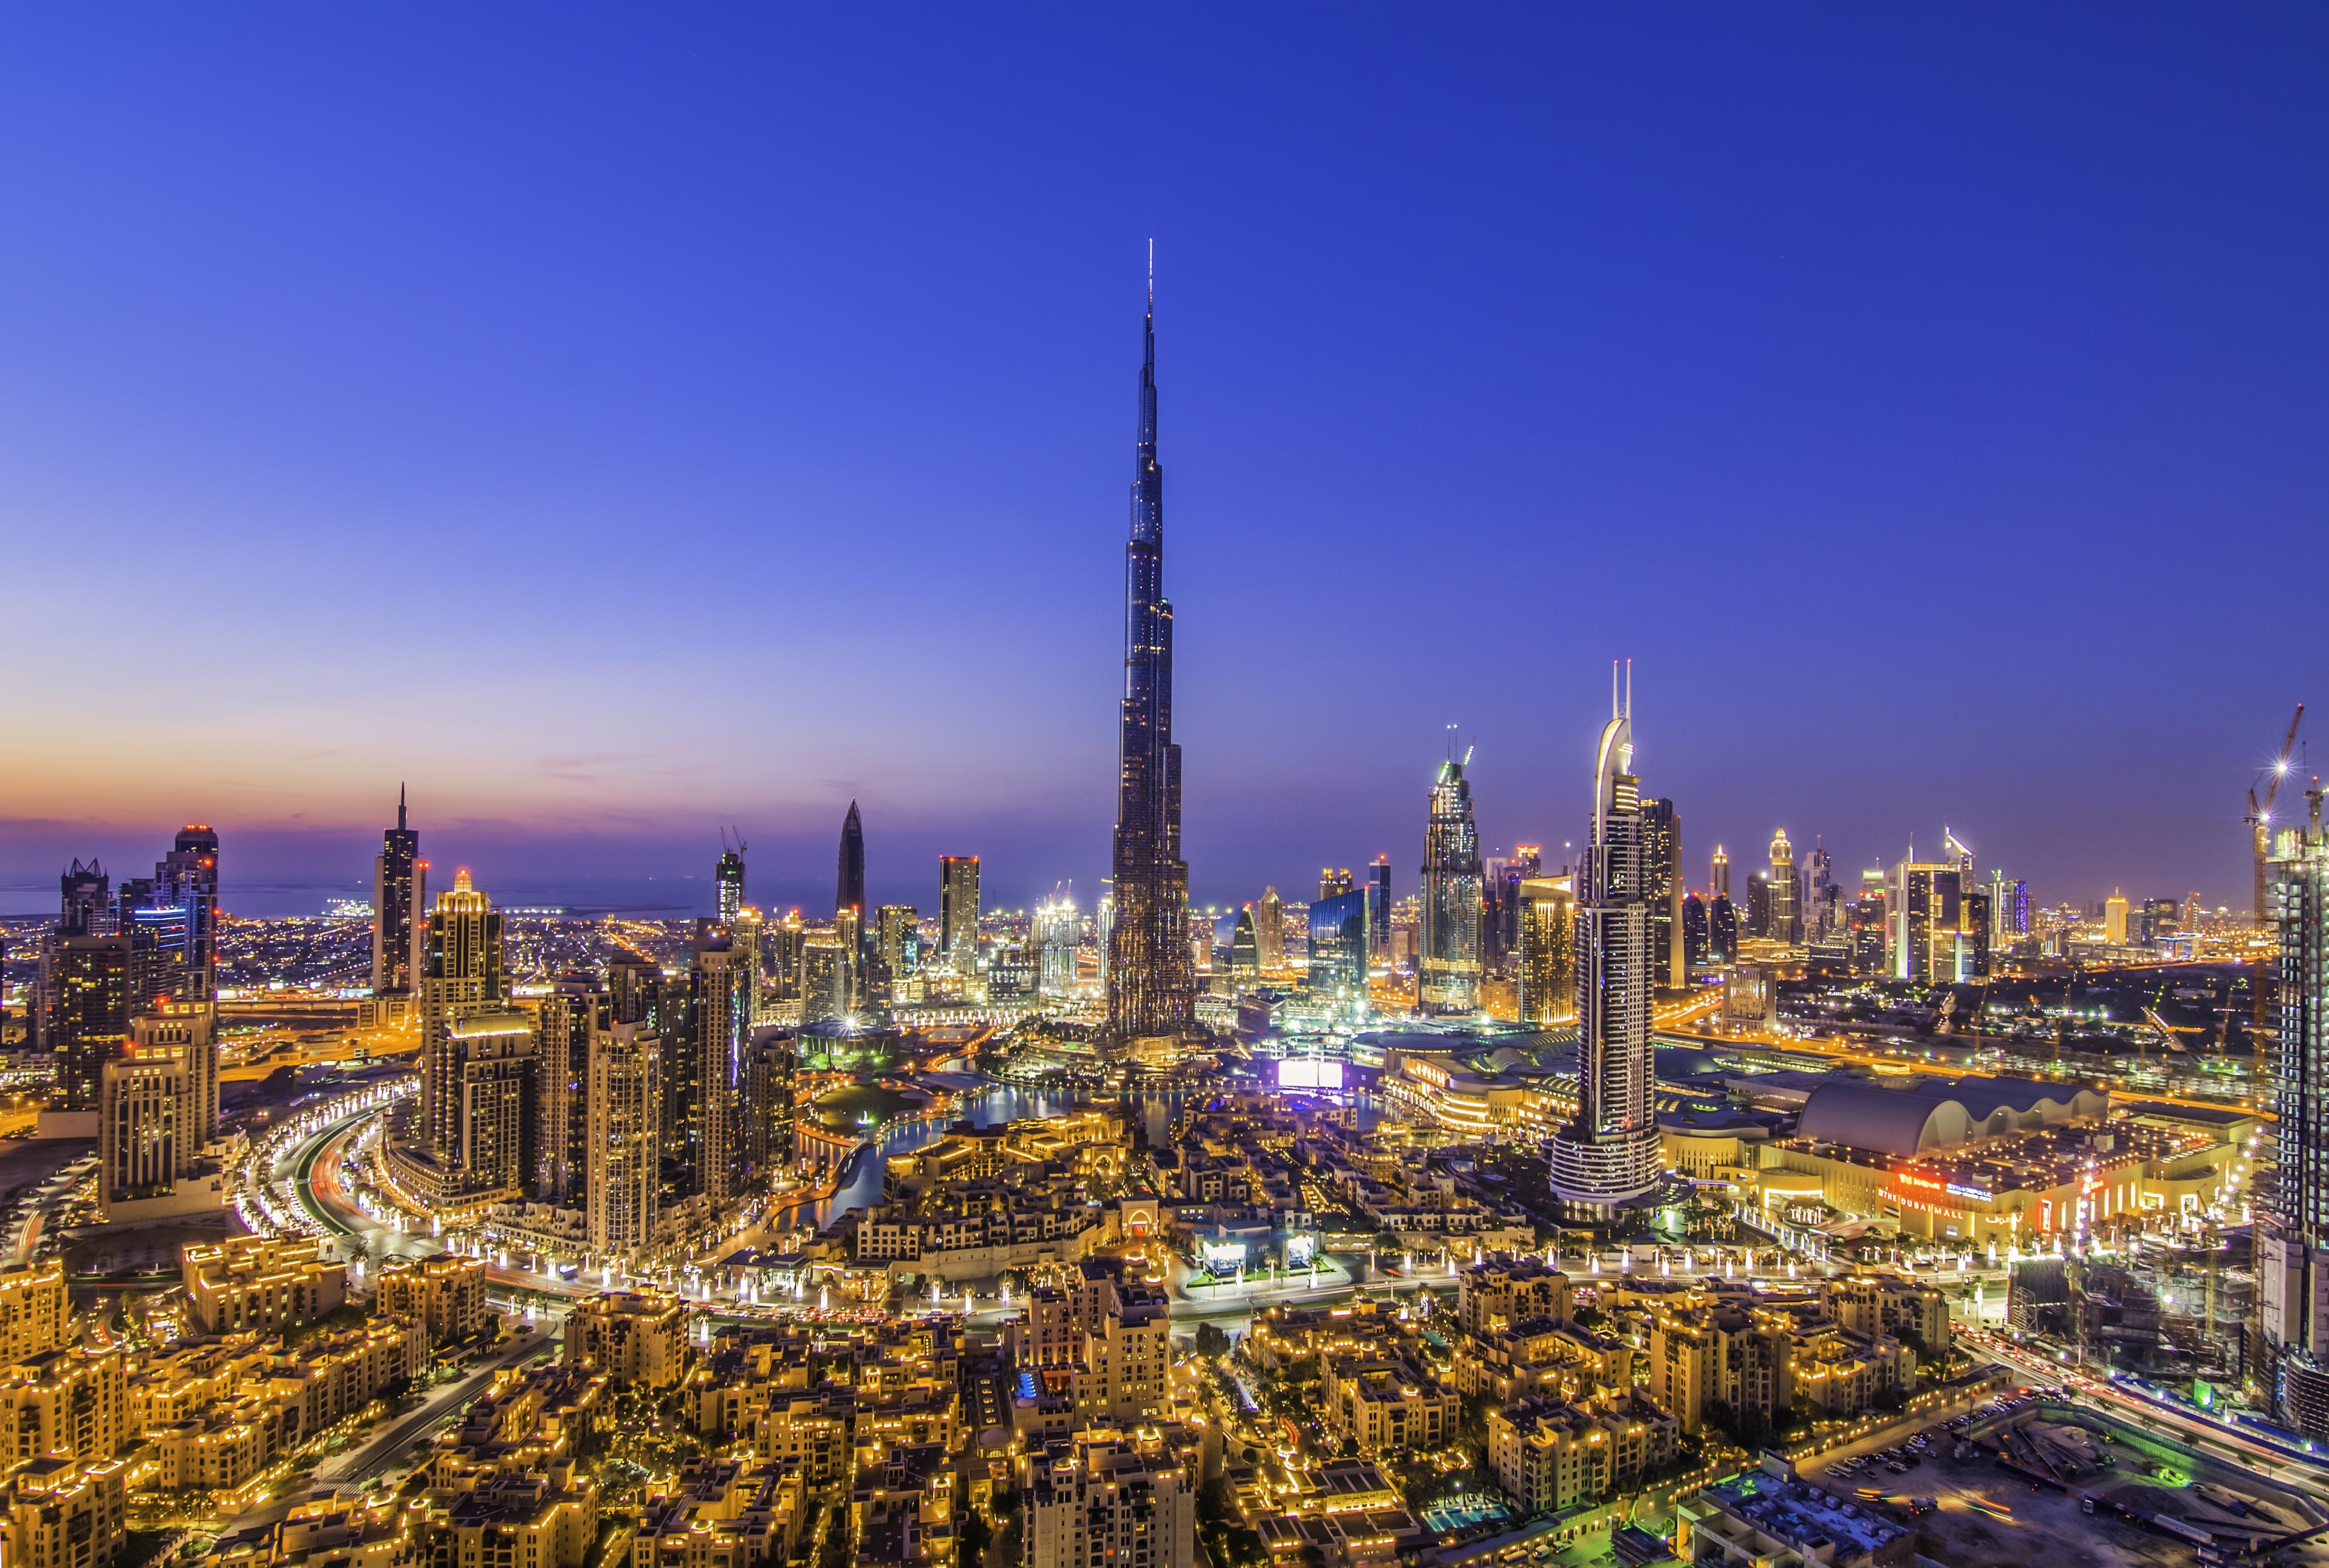 Dubai records 8 million overnight visitors during H1, 2017